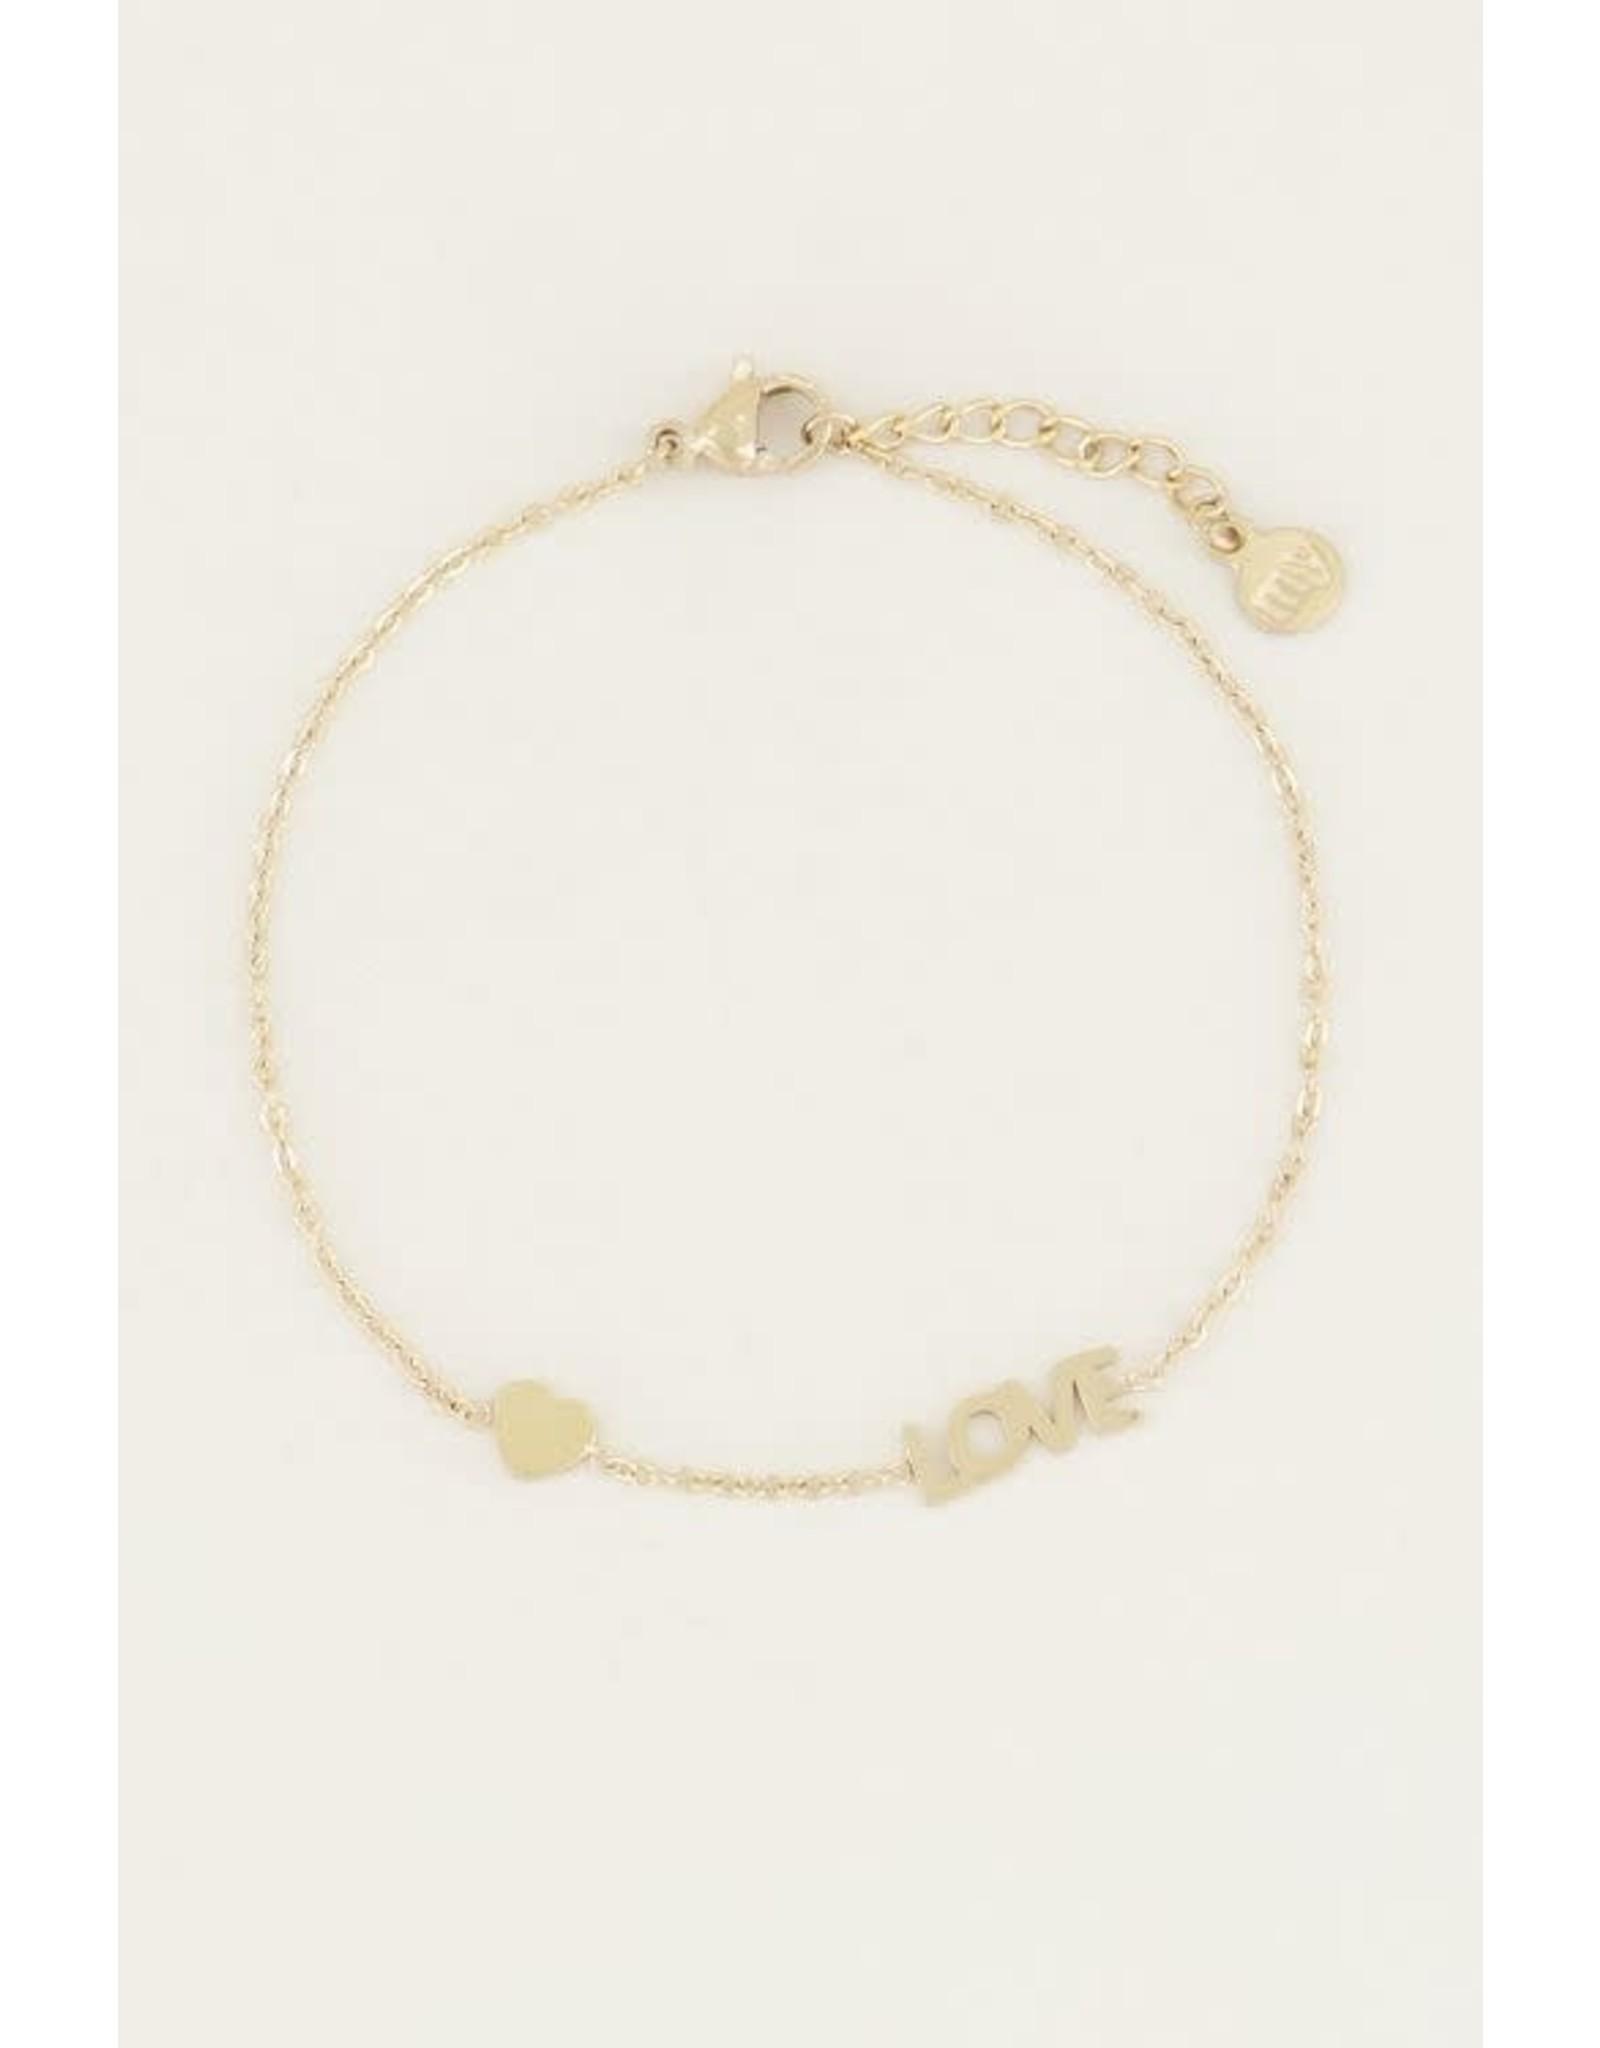 My Jewellery My Jewellery armband love en hart